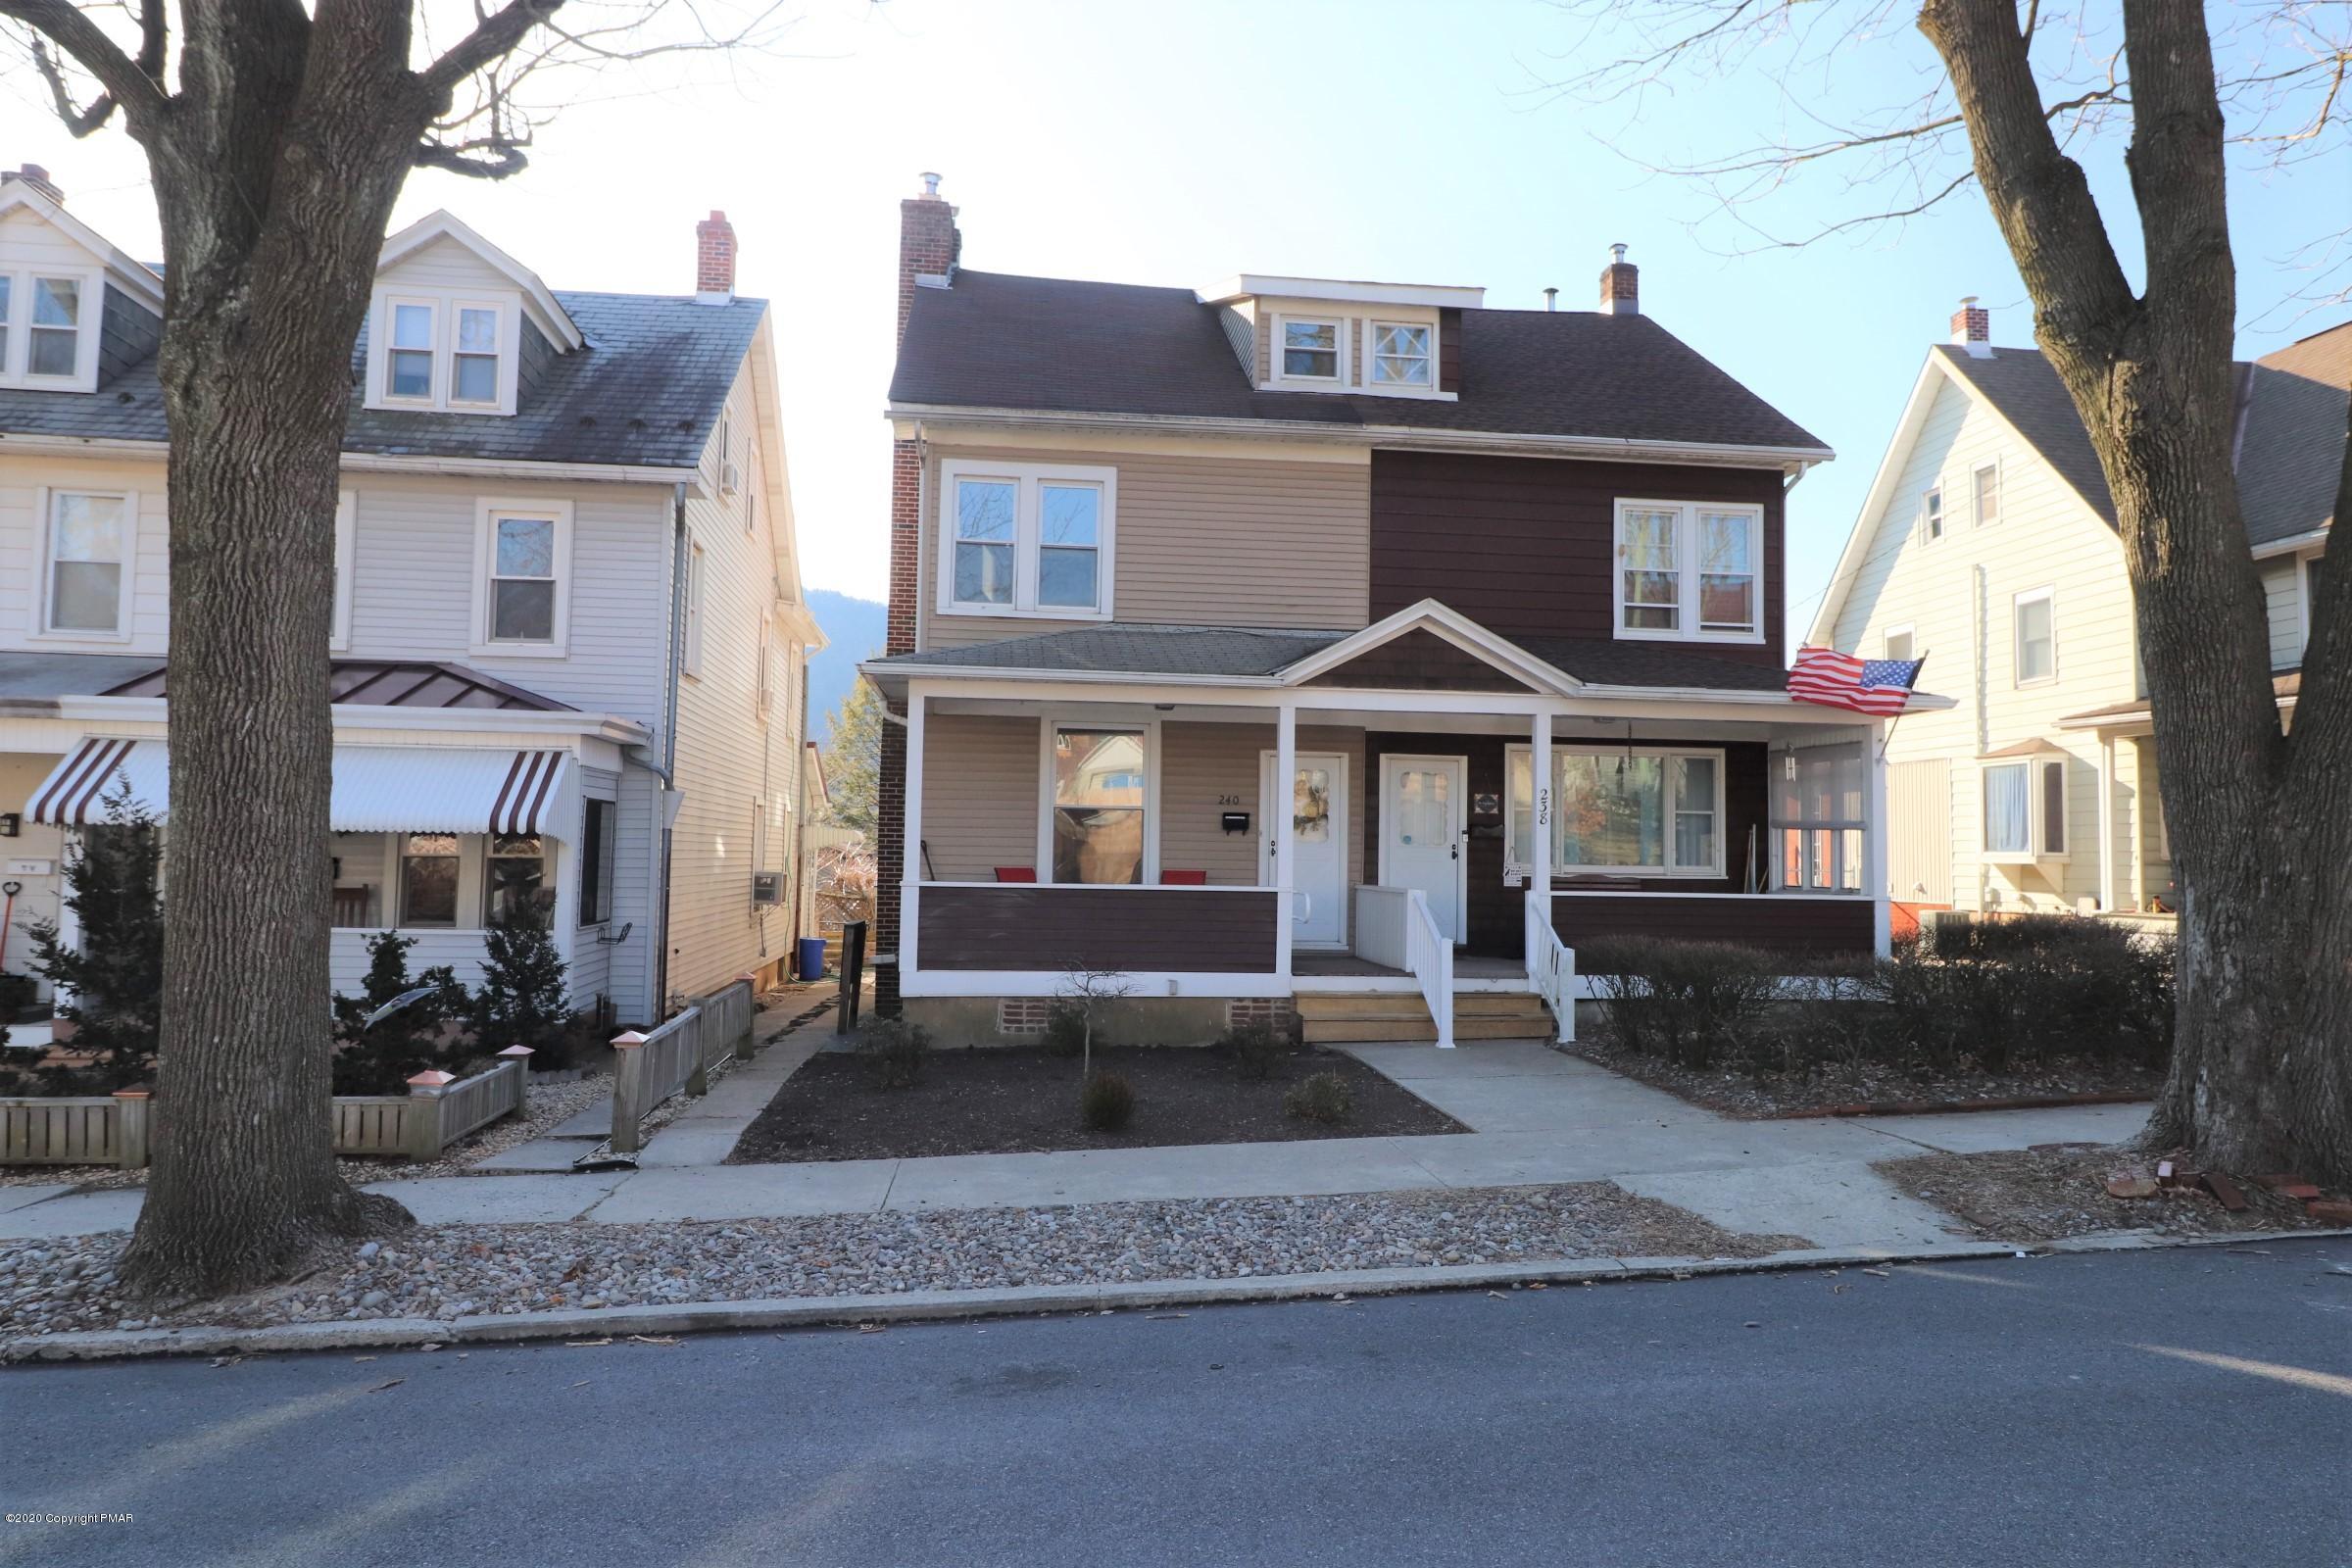 240 Columbia Ave, Palmerton, PA 18071